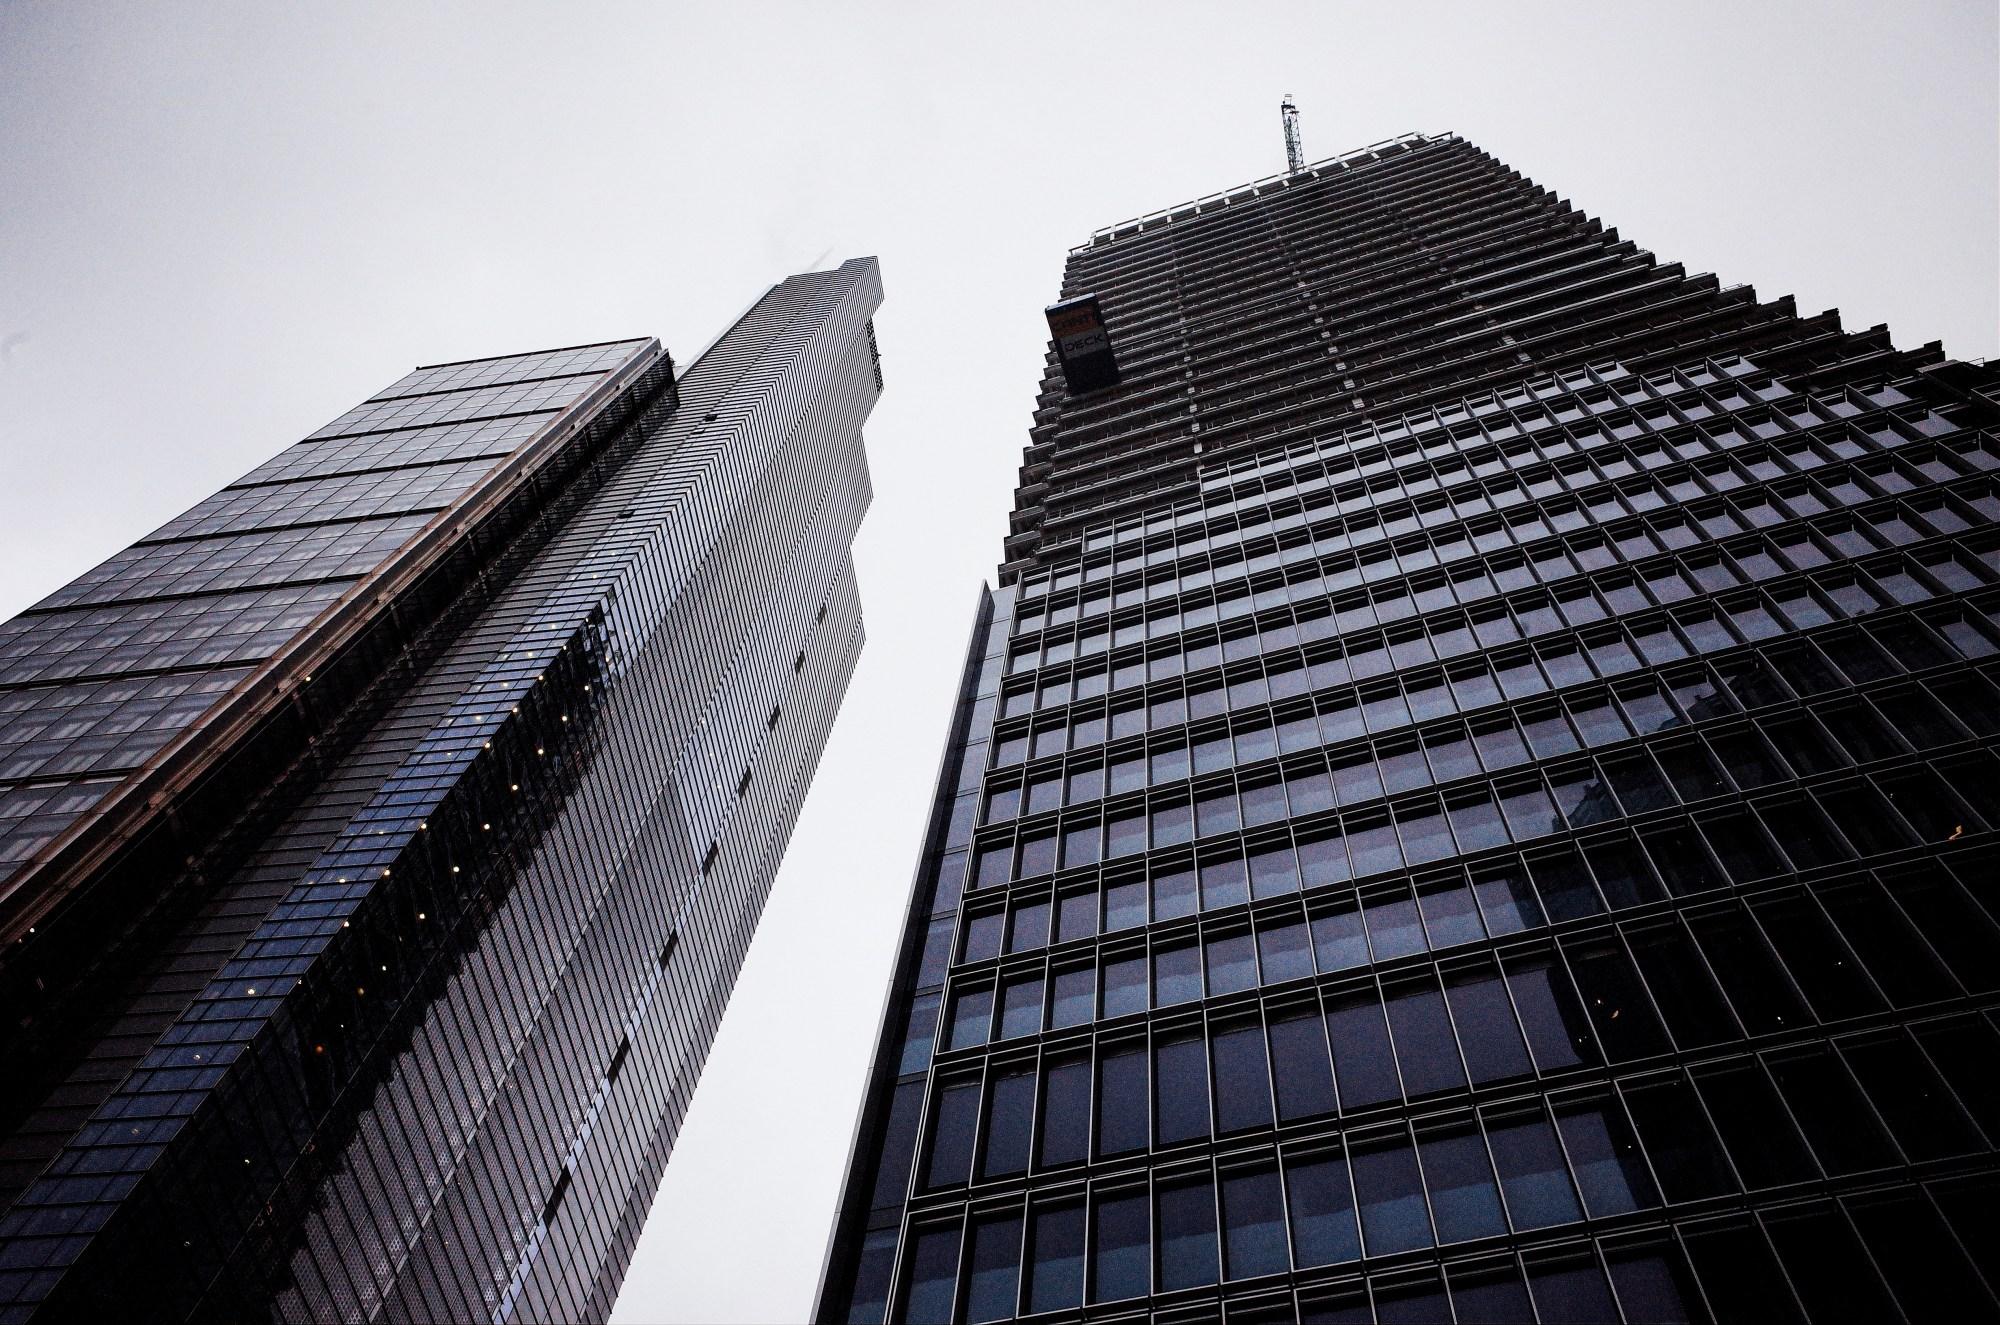 London architecture, 2018